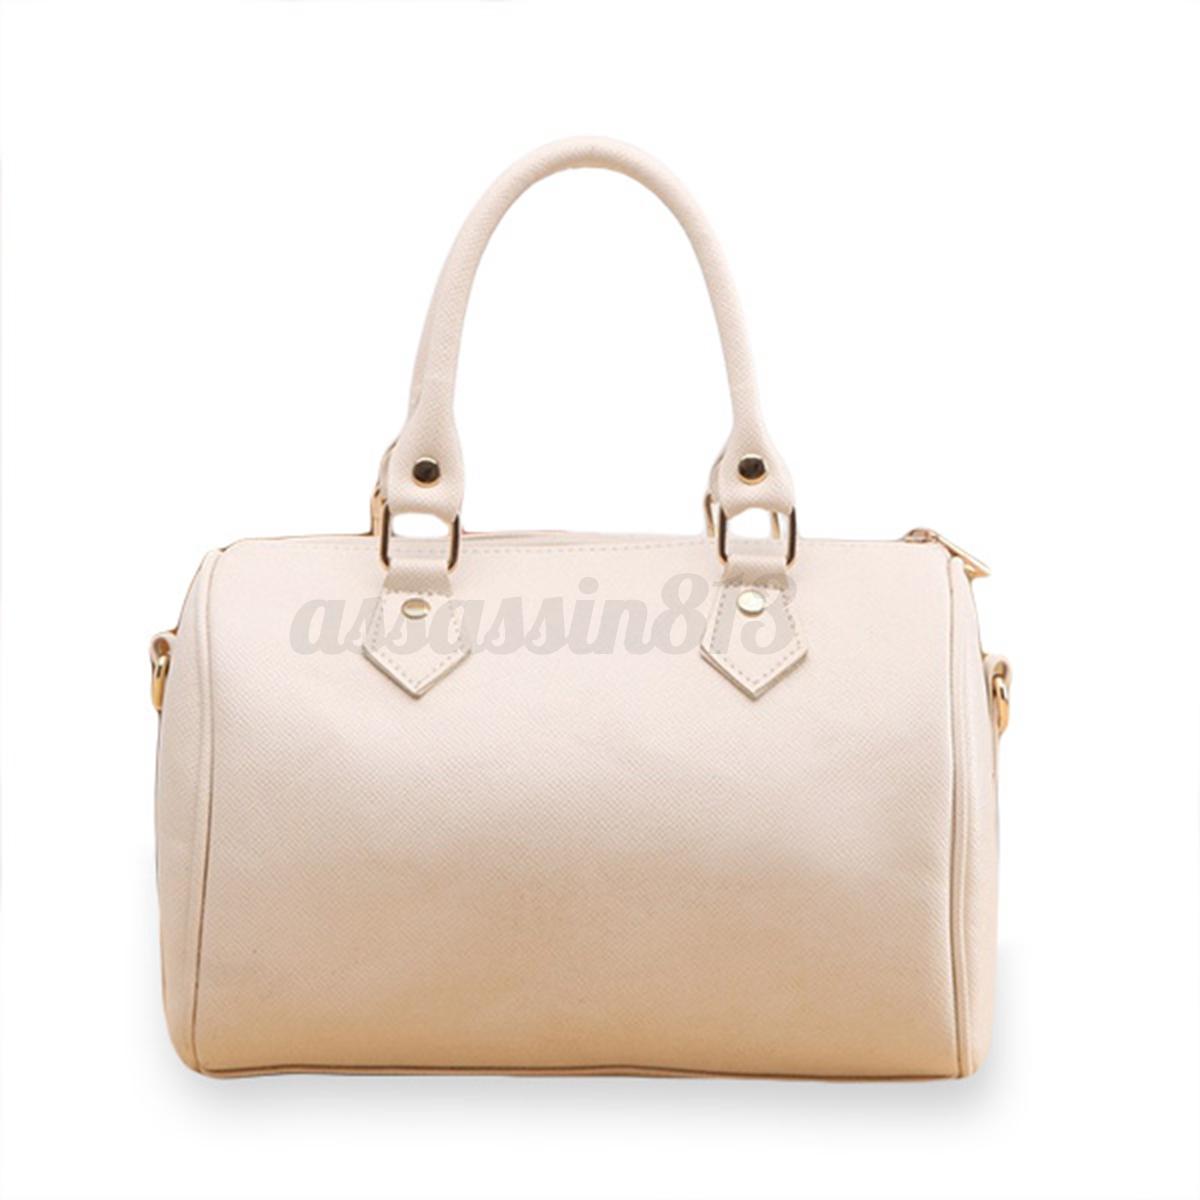 Women Leather Handbag Shoulder Shopping Bag Tote Lady Purse ...